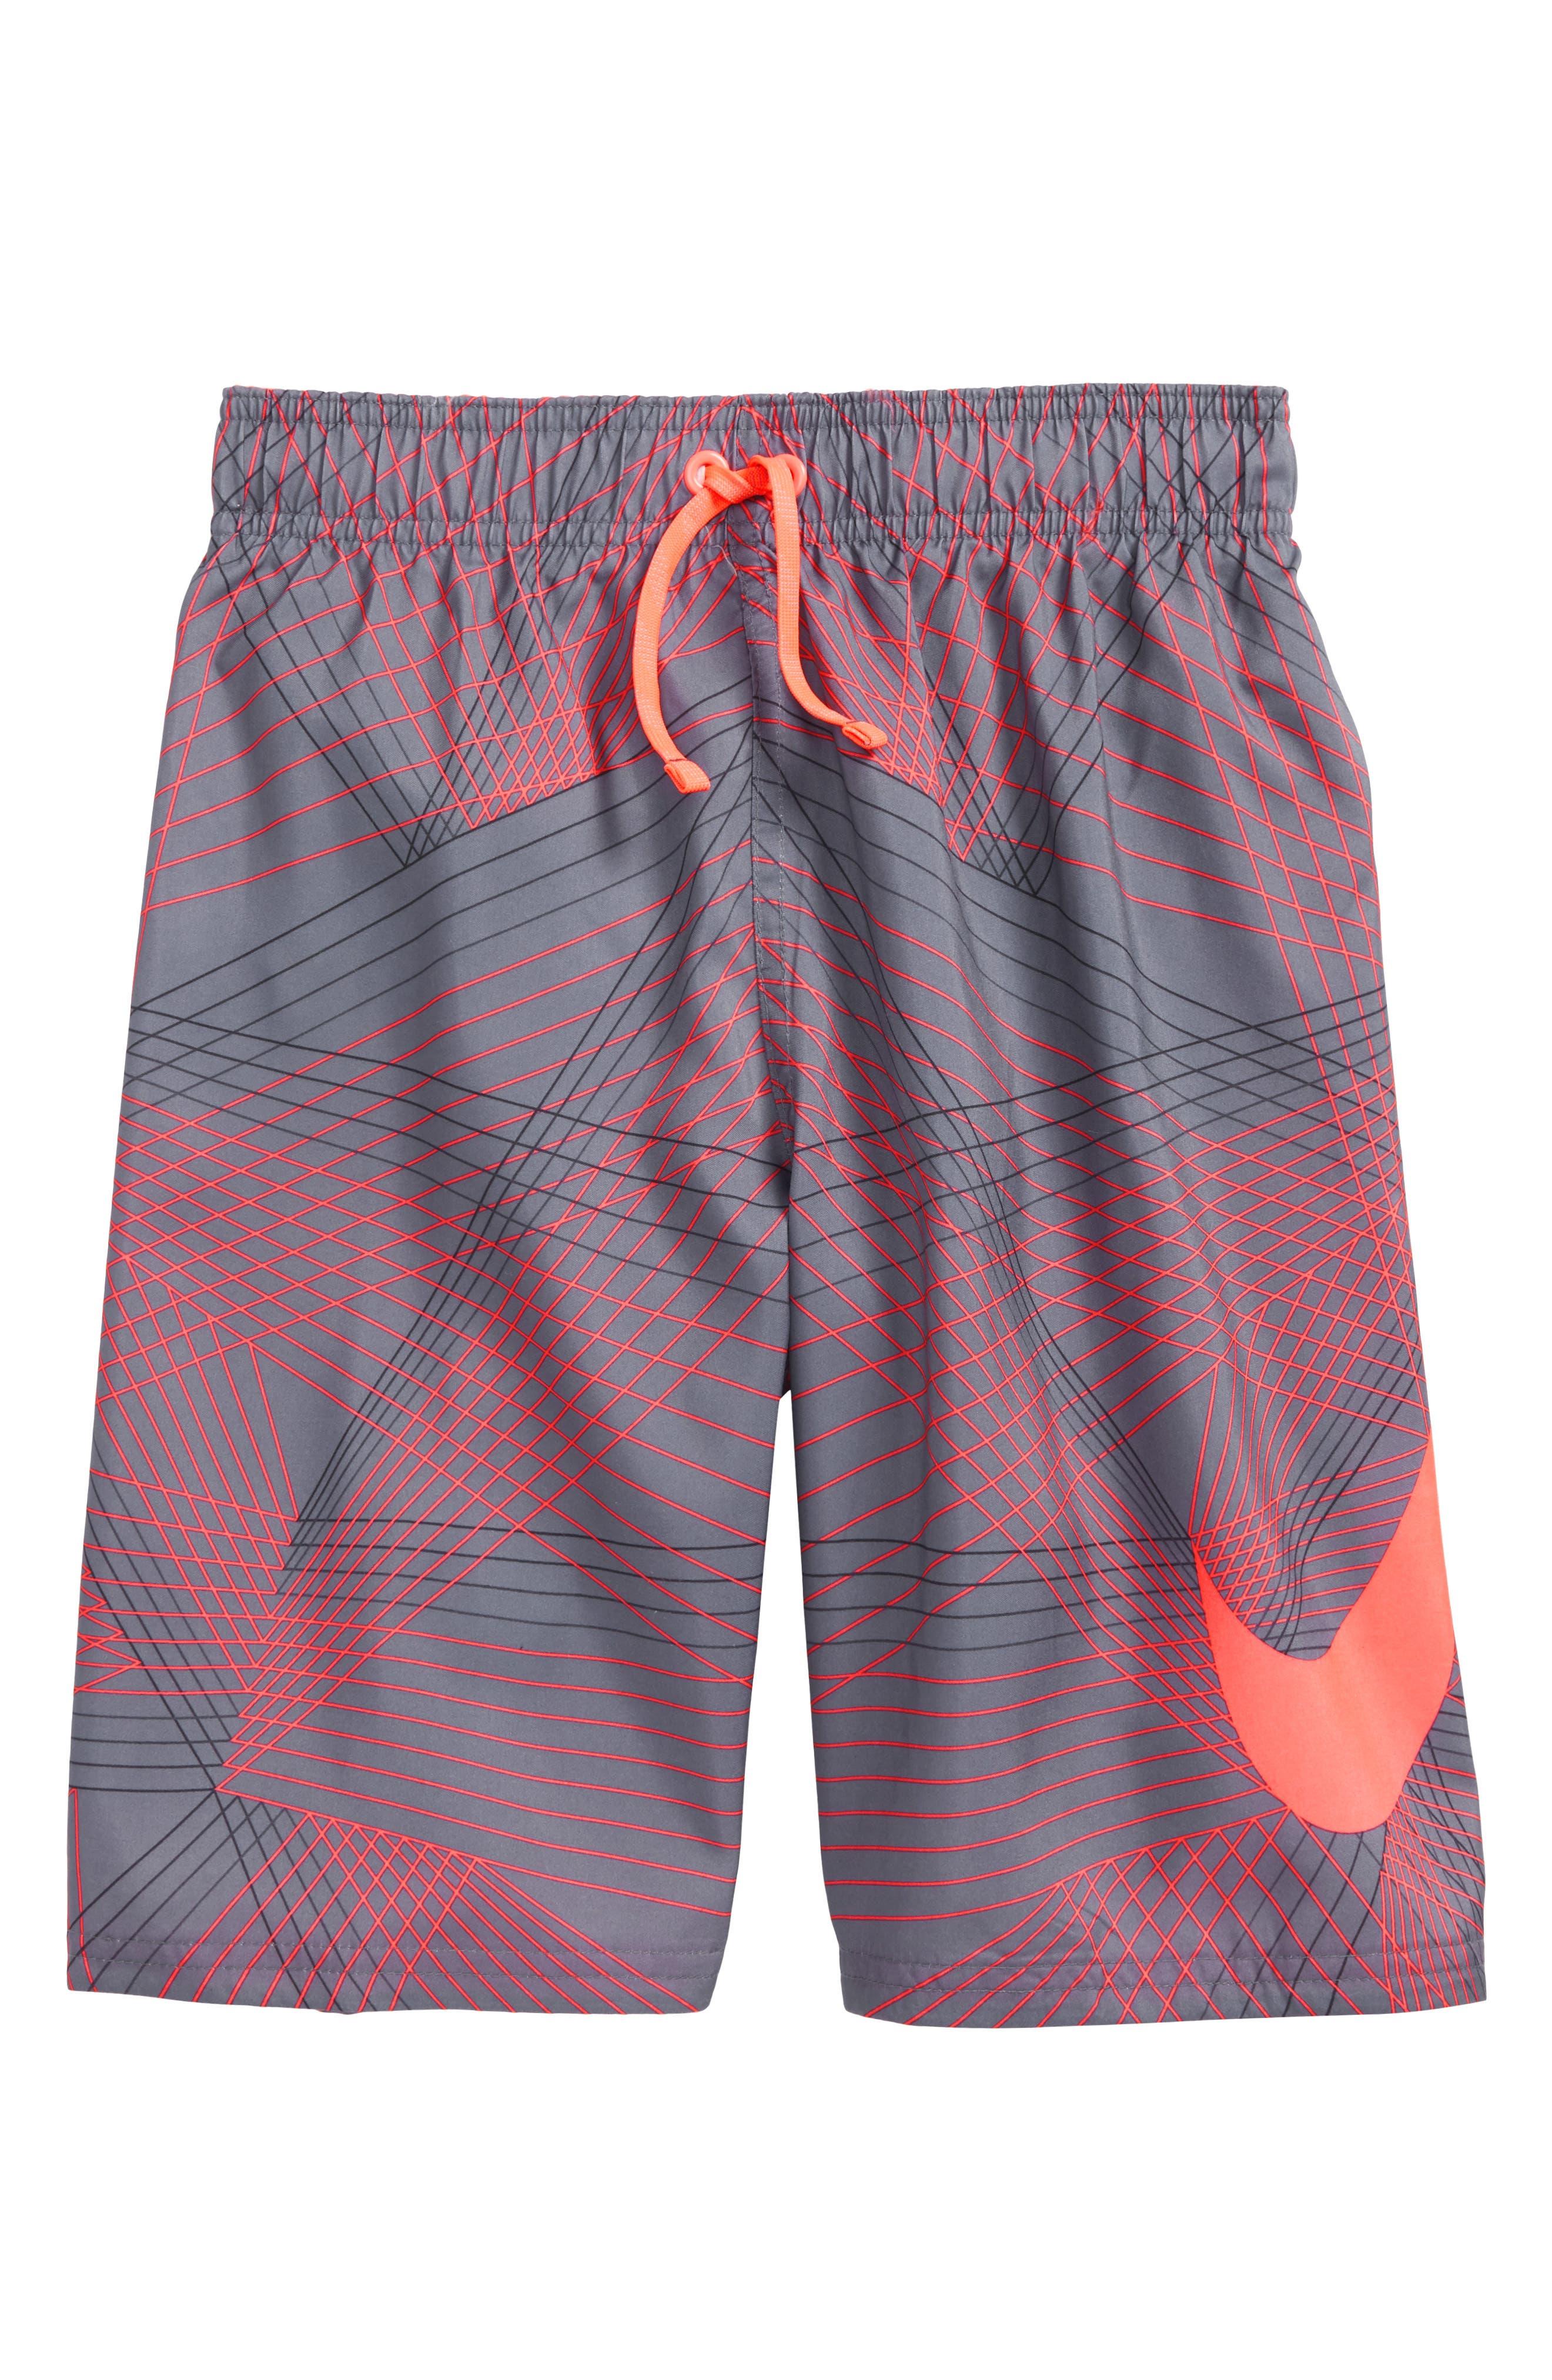 Breaker Volley Shorts,                         Main,                         color, Light Carbon